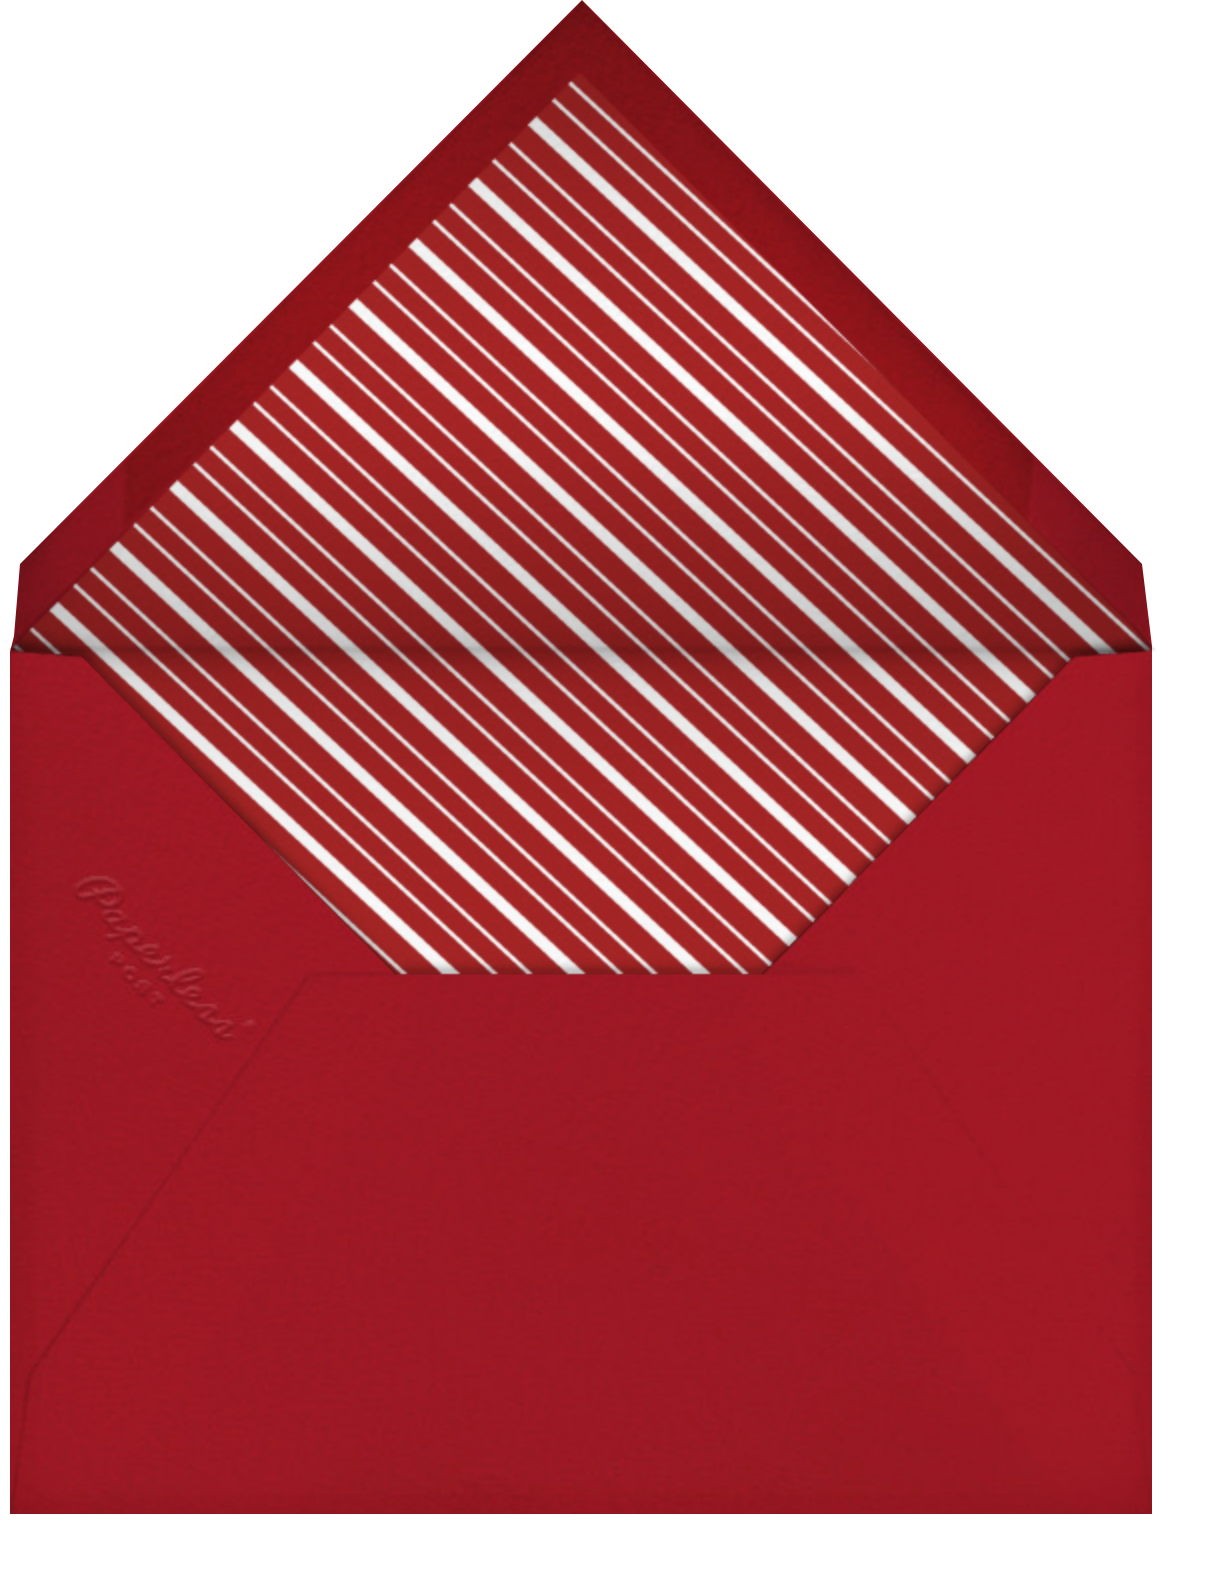 Tiny Toast - Tan - Paperless Post - Envelope